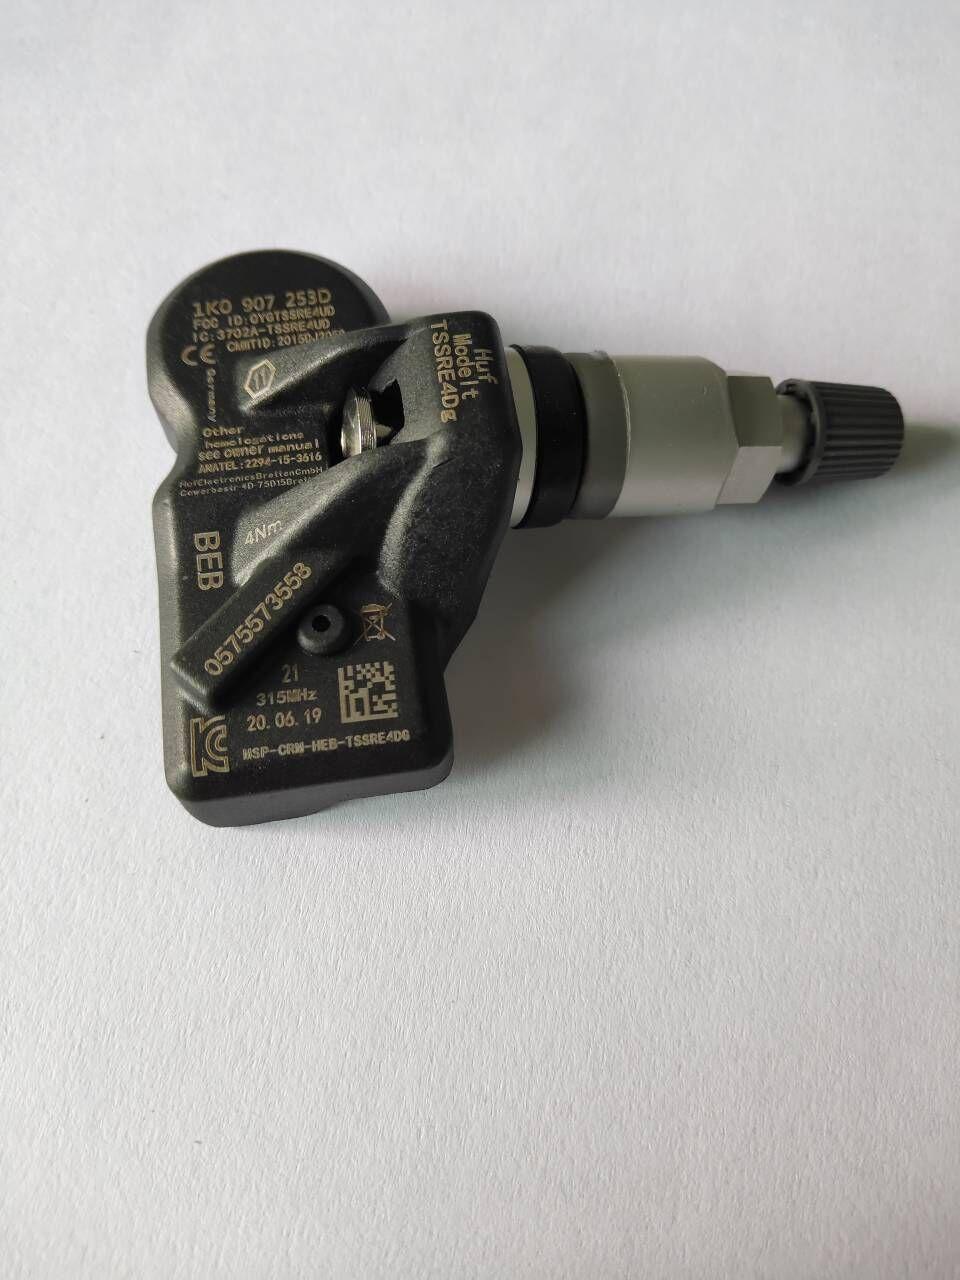 TPMS Tire Pressure Sensor 1K0907253D 315 MHz For Volkswagen VW Tiguan 2009/01-2011/12 Tire Pressure Monitor System 1K0907253D